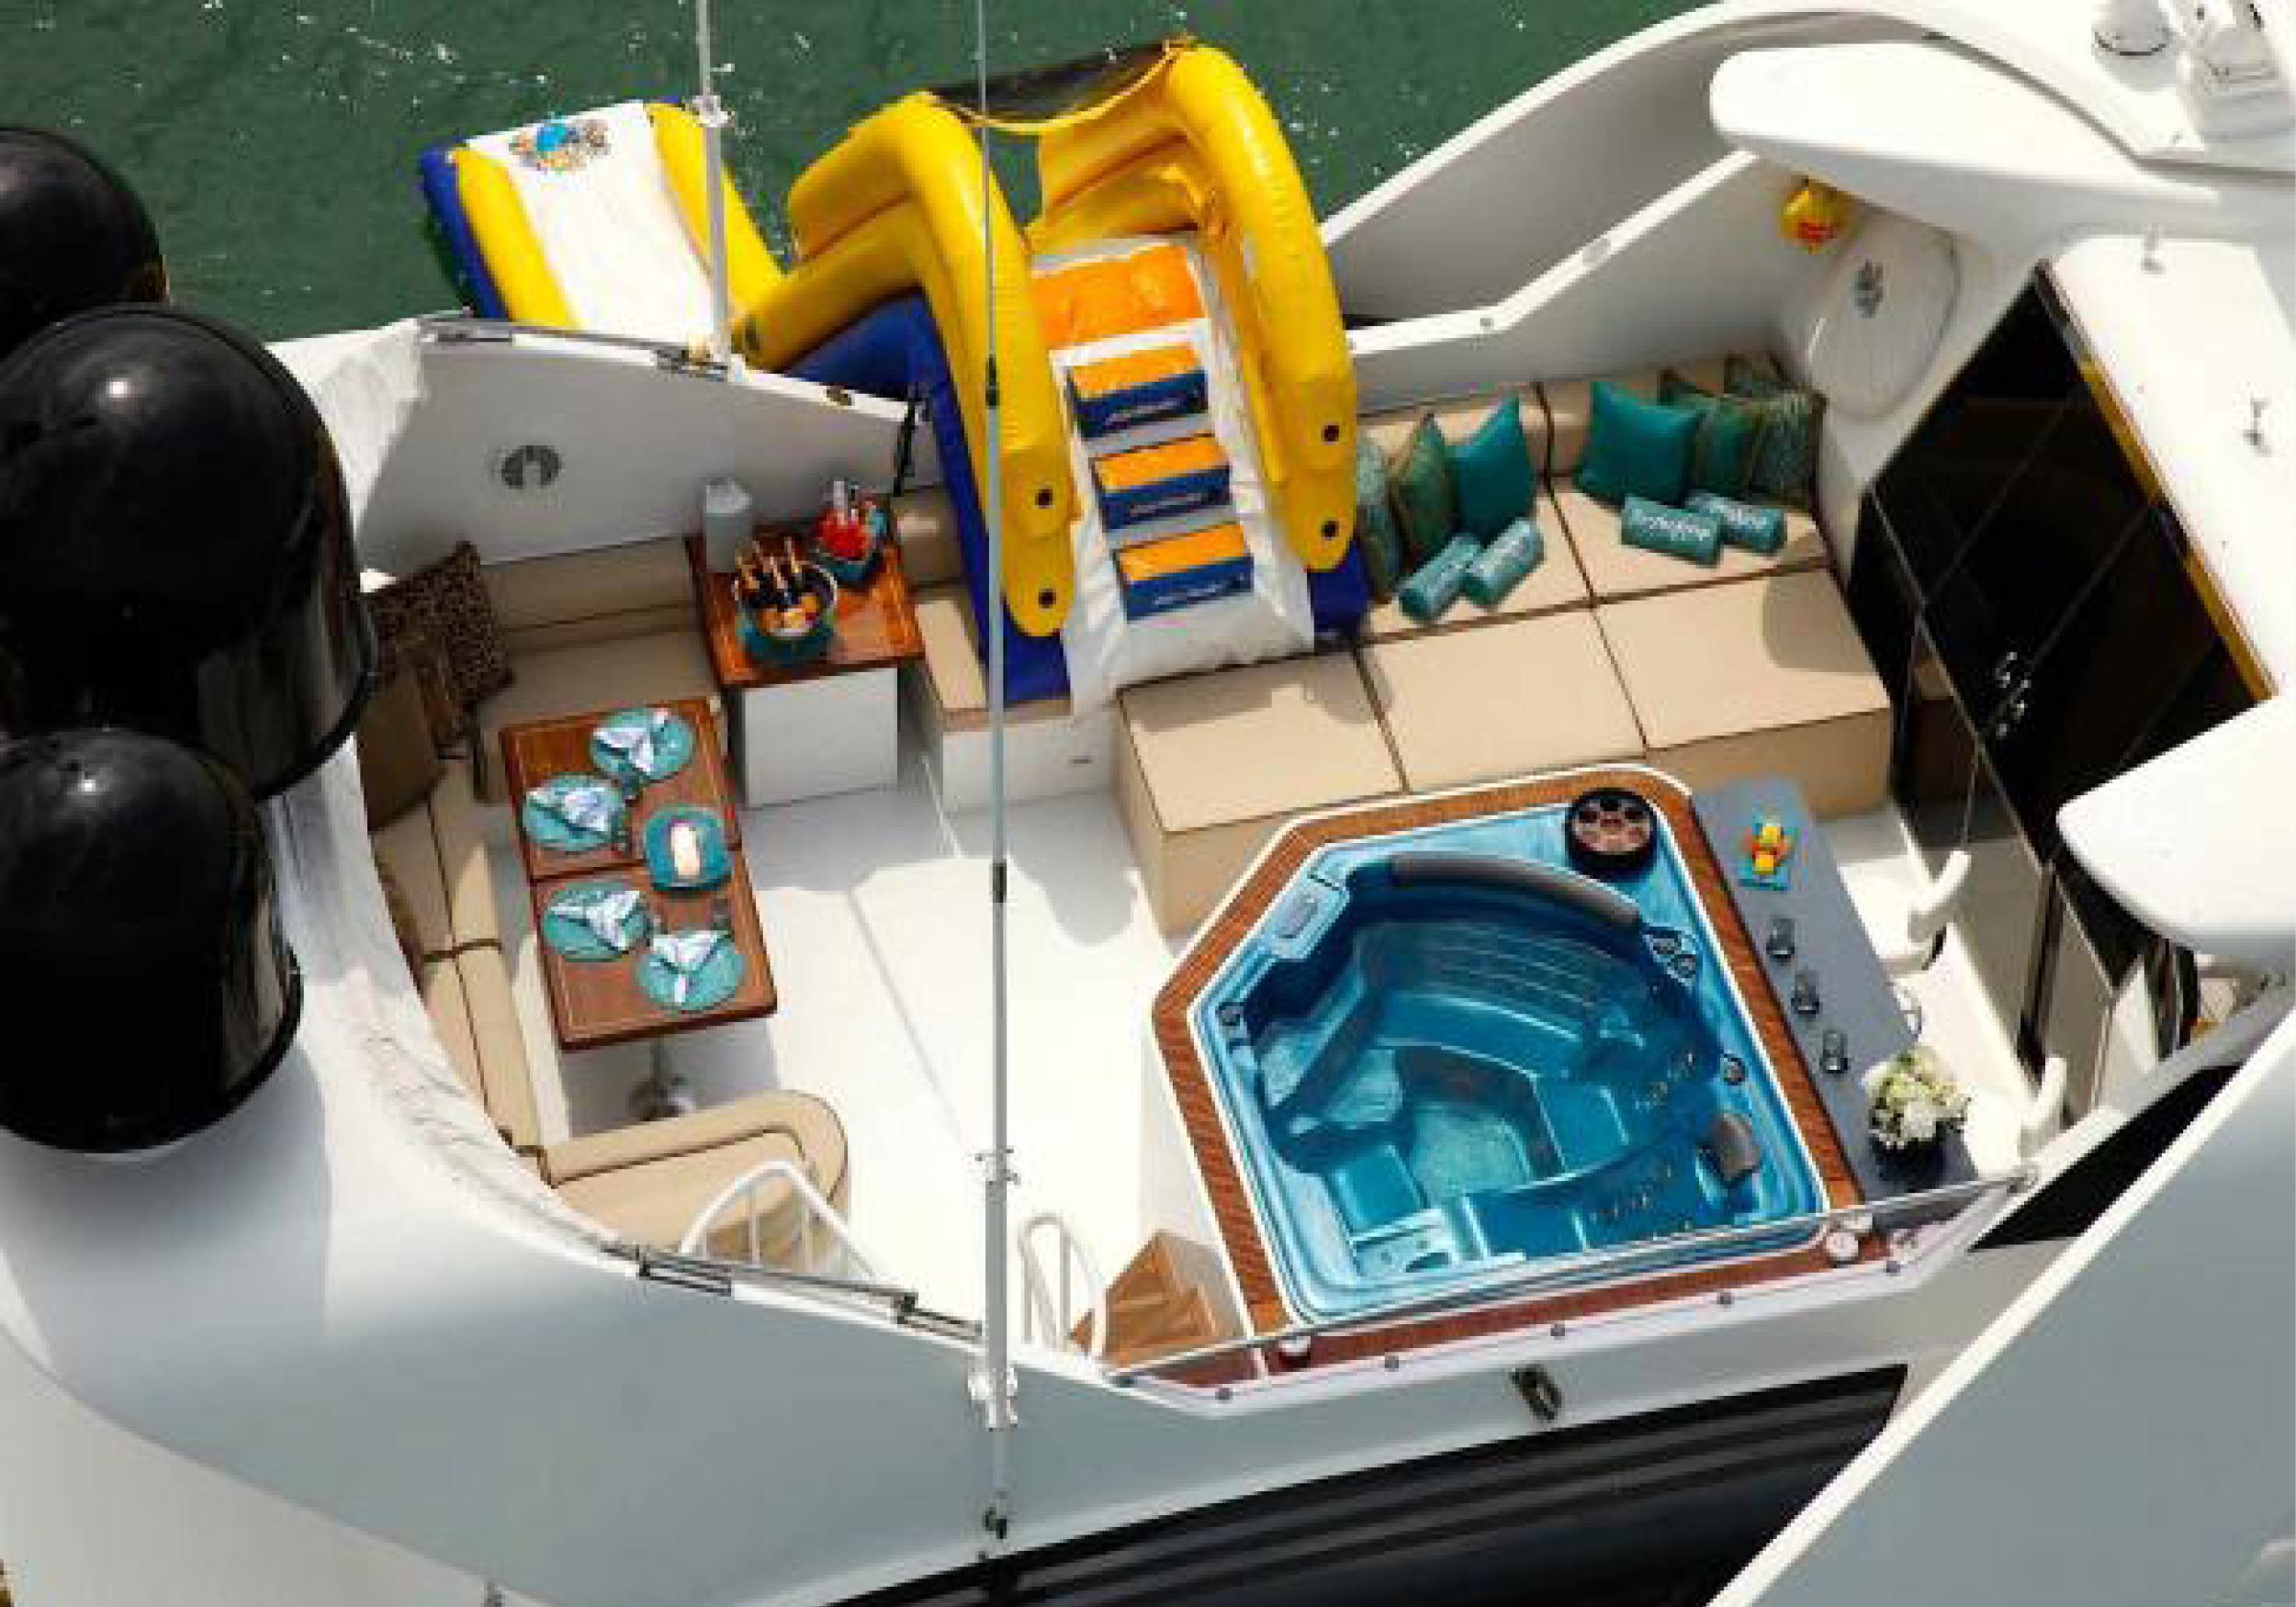 Karen-Lynn-Interior-Design-Yacht-Impulsive-19.jpg